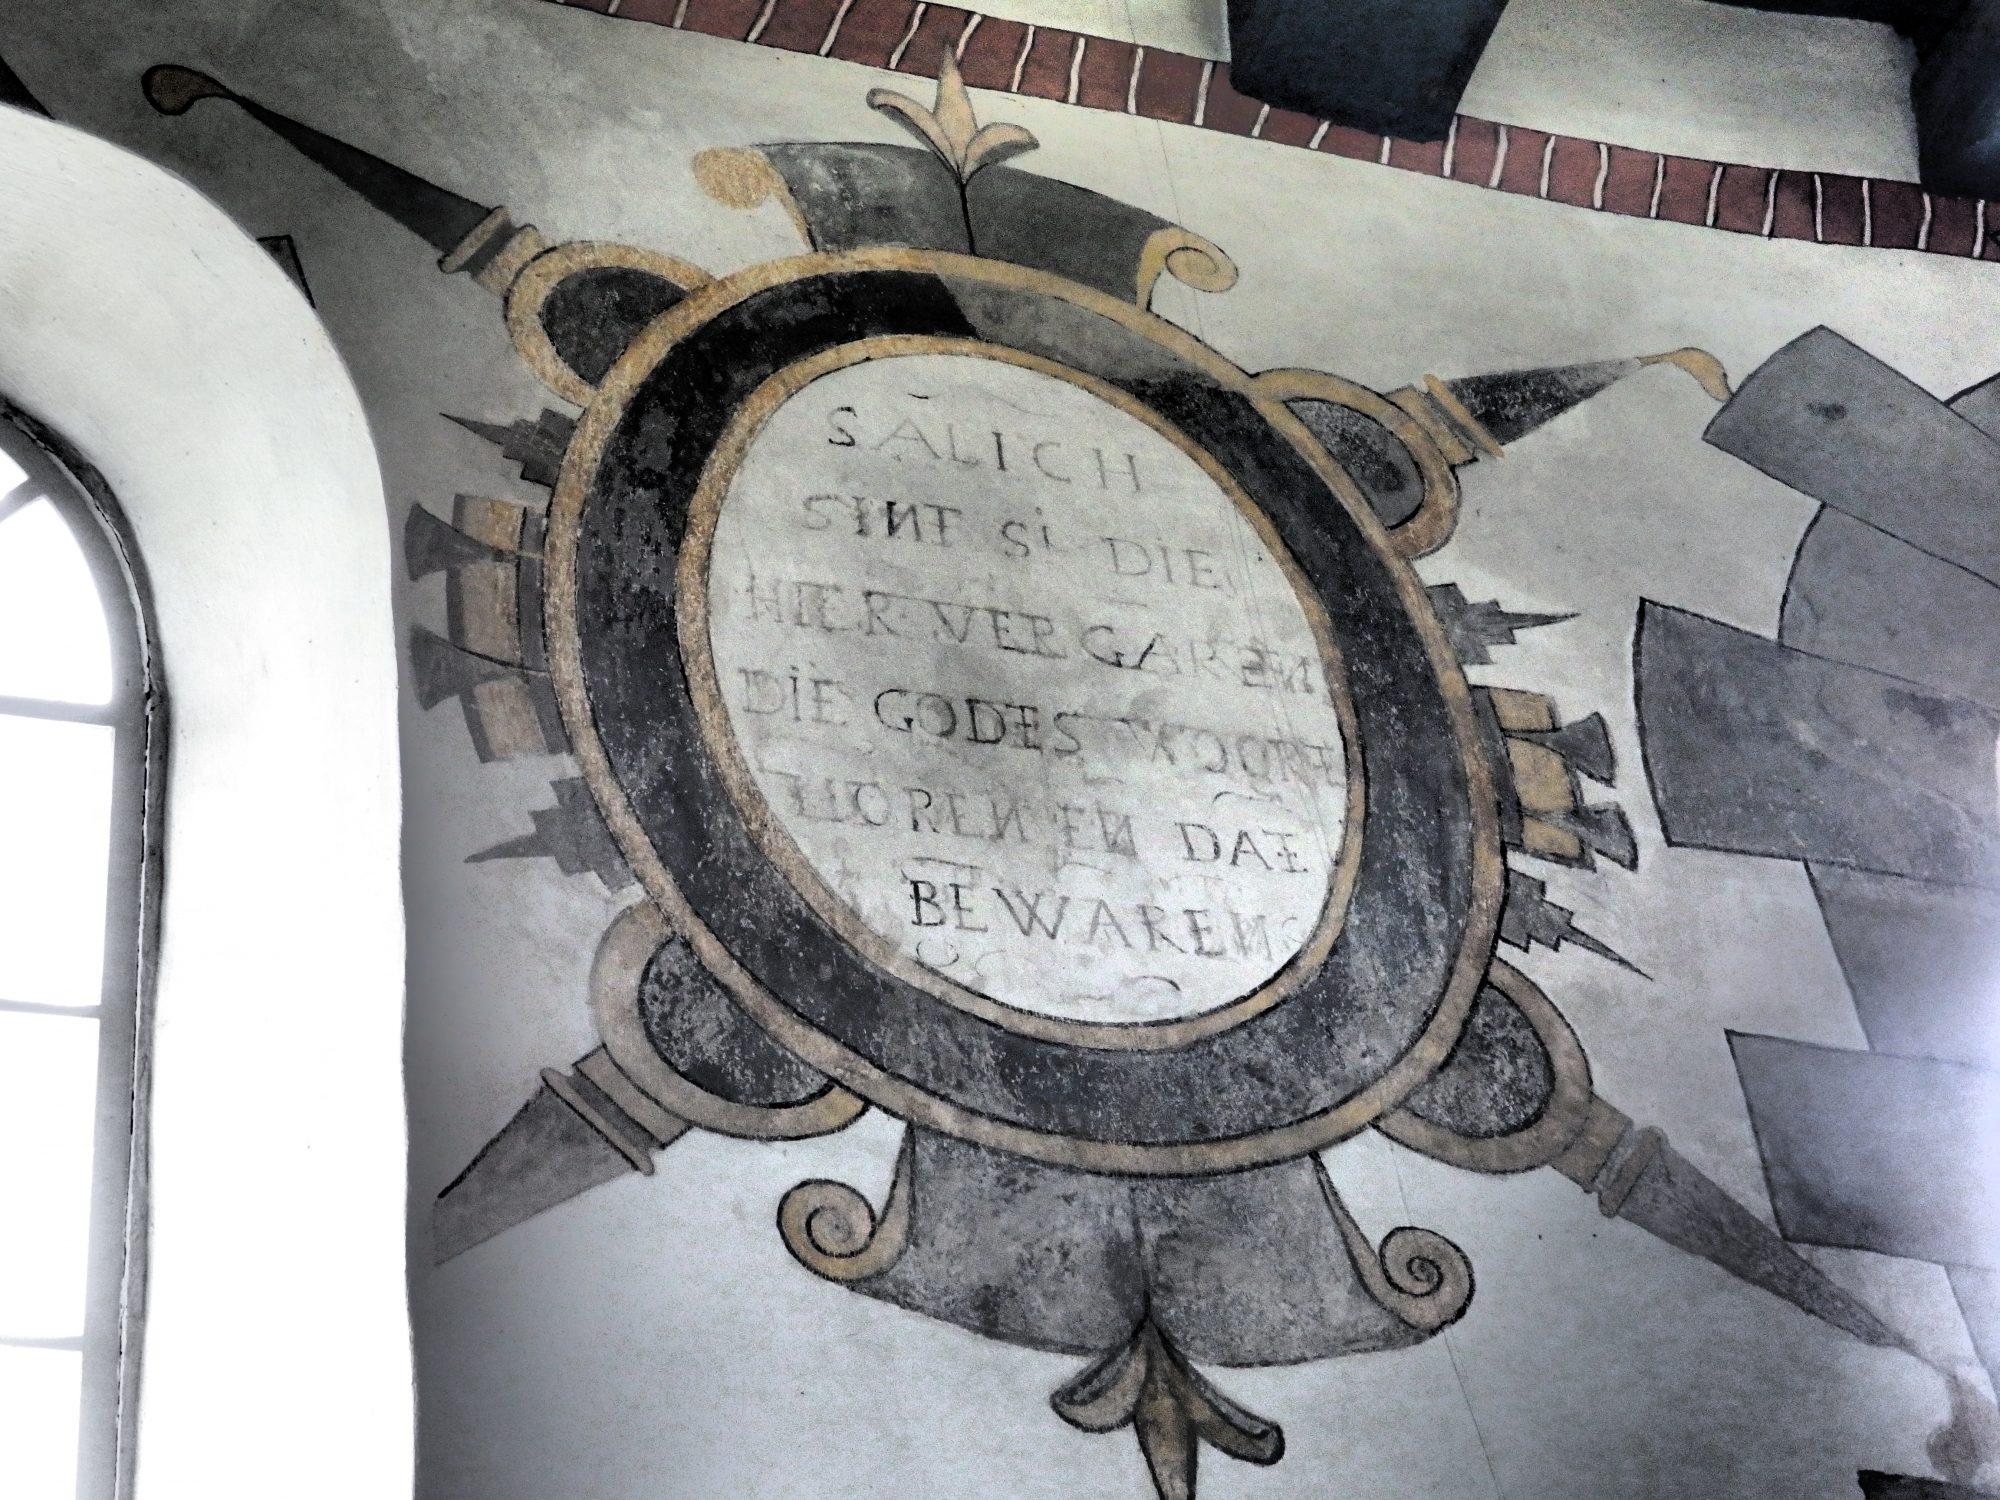 a restored fresco in Eenrum church in Groningen province